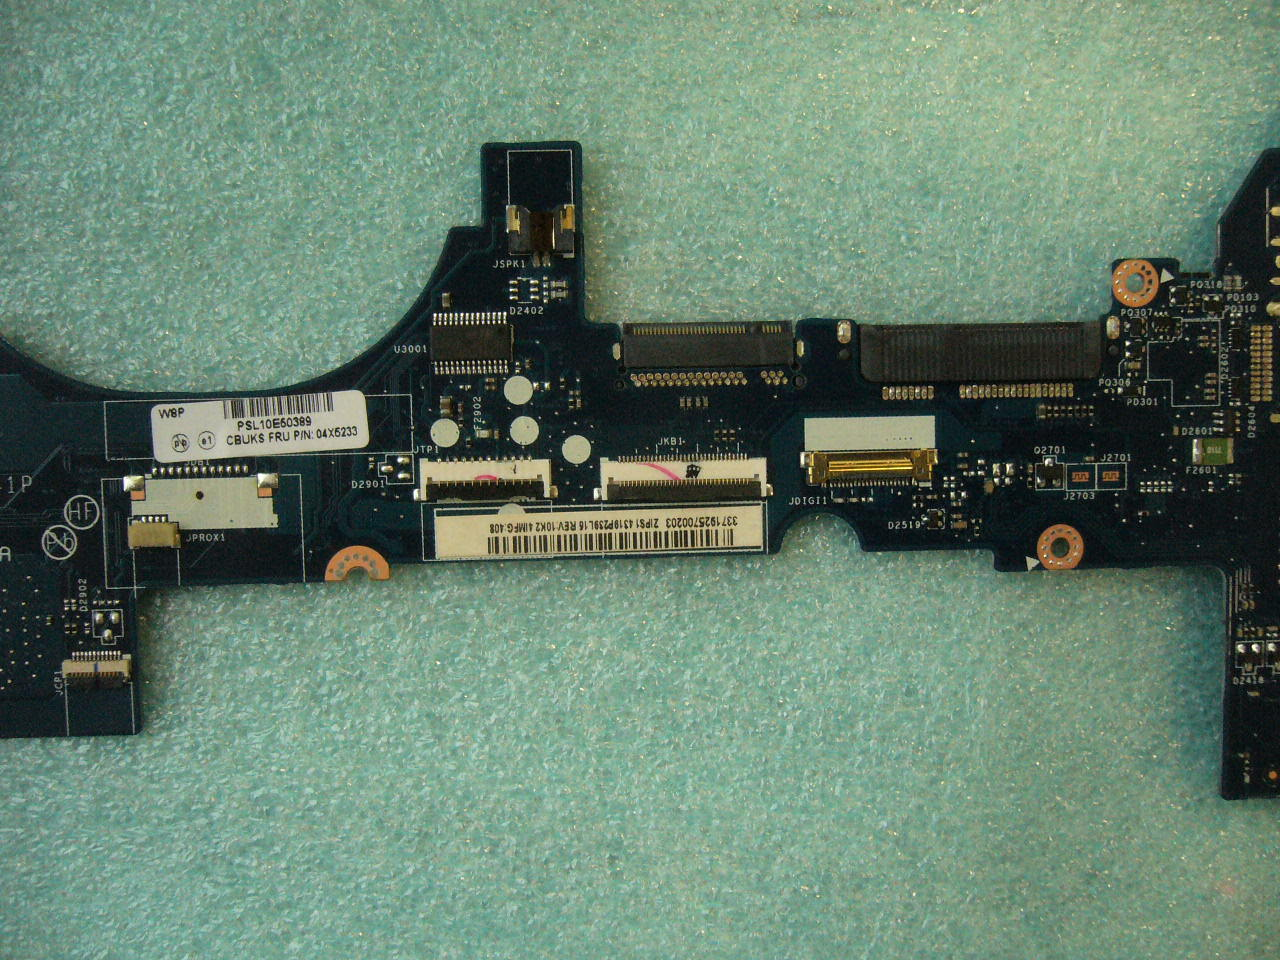 QTY 1x Lenovo Thinkpad Yoga S1 laptop motherboard i5-4200U 4GB LA-A341P ZIPS1